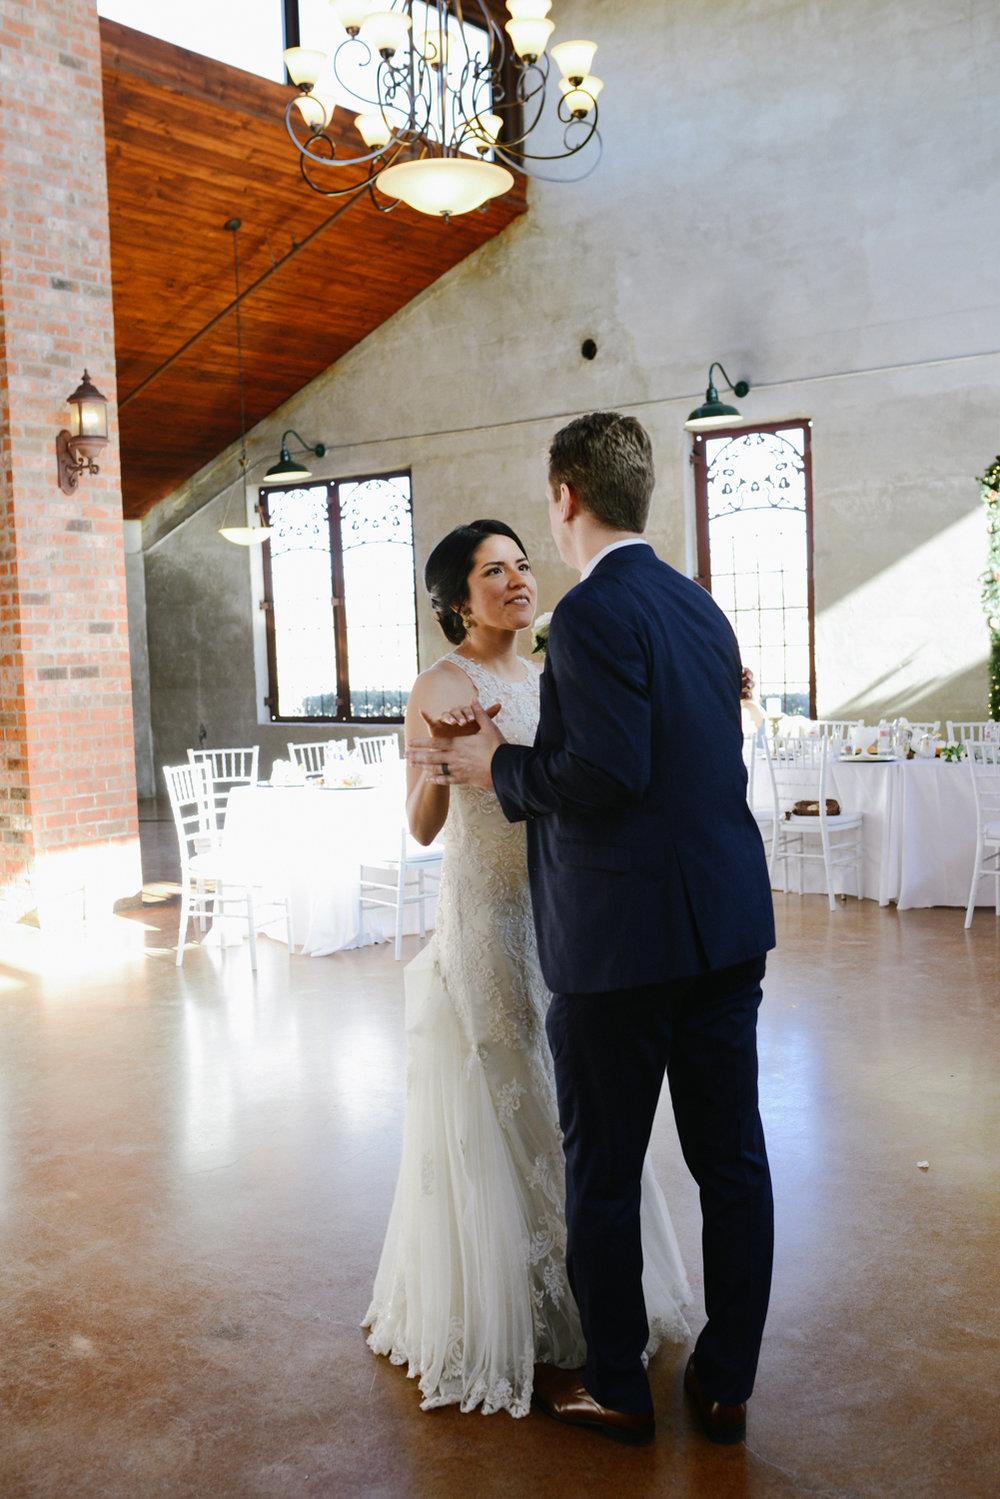 casperwedding-texasweddings-houstonweddings-oldedobbestation-montgomerytx-montgomeryweddings-bride-groom-bridalparty-weddingdress-96.jpg